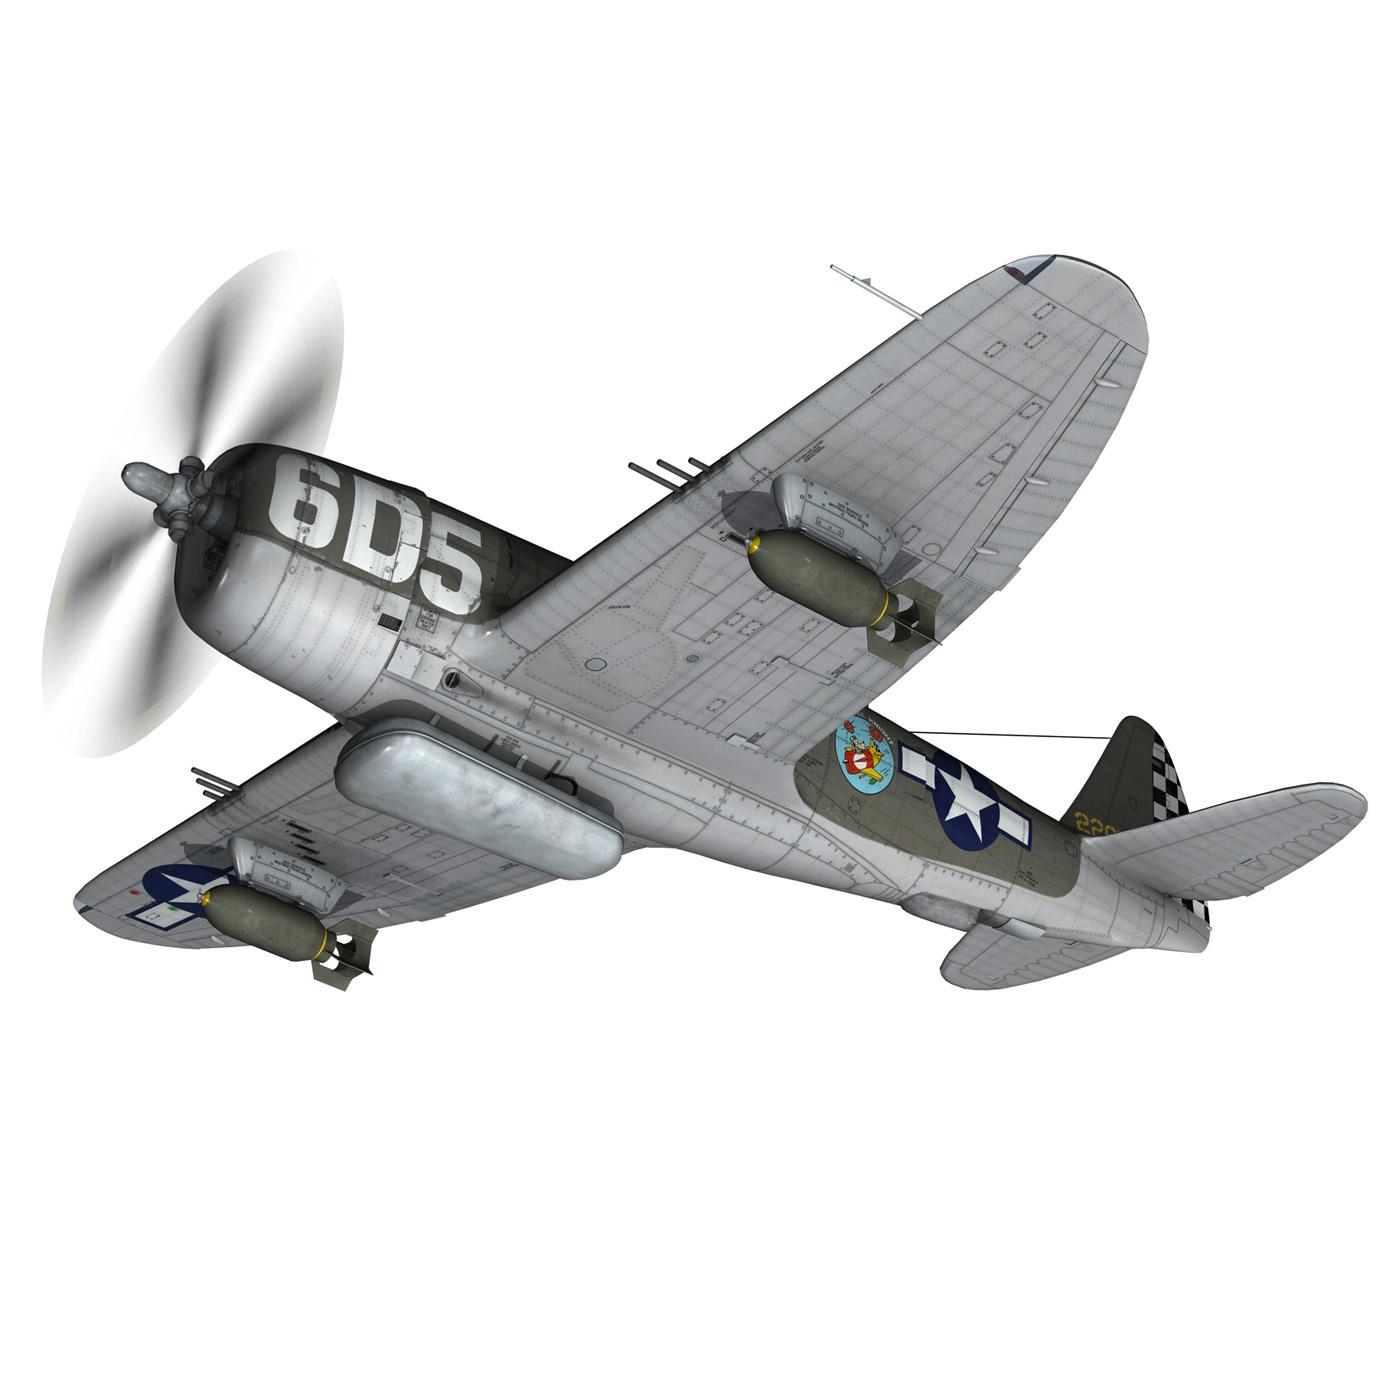 republic p-47 thunderbolt – oh johnnie 3d model fbx c4d lwo obj 274250